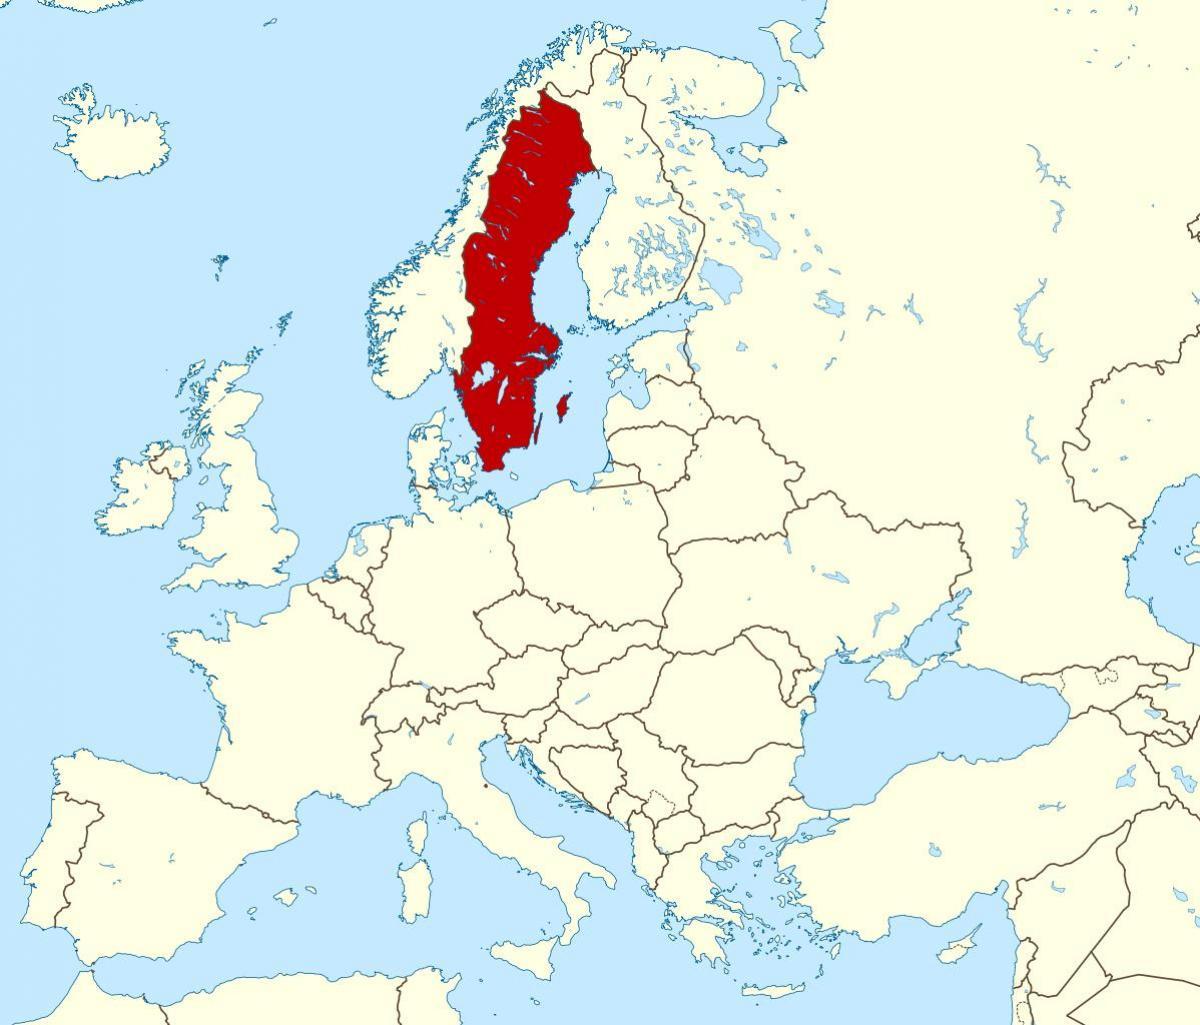 Europakarte Nordeuropa Karte.Schweden Landkarte Europa Karte Von Schweden In Europa Nordeuropa